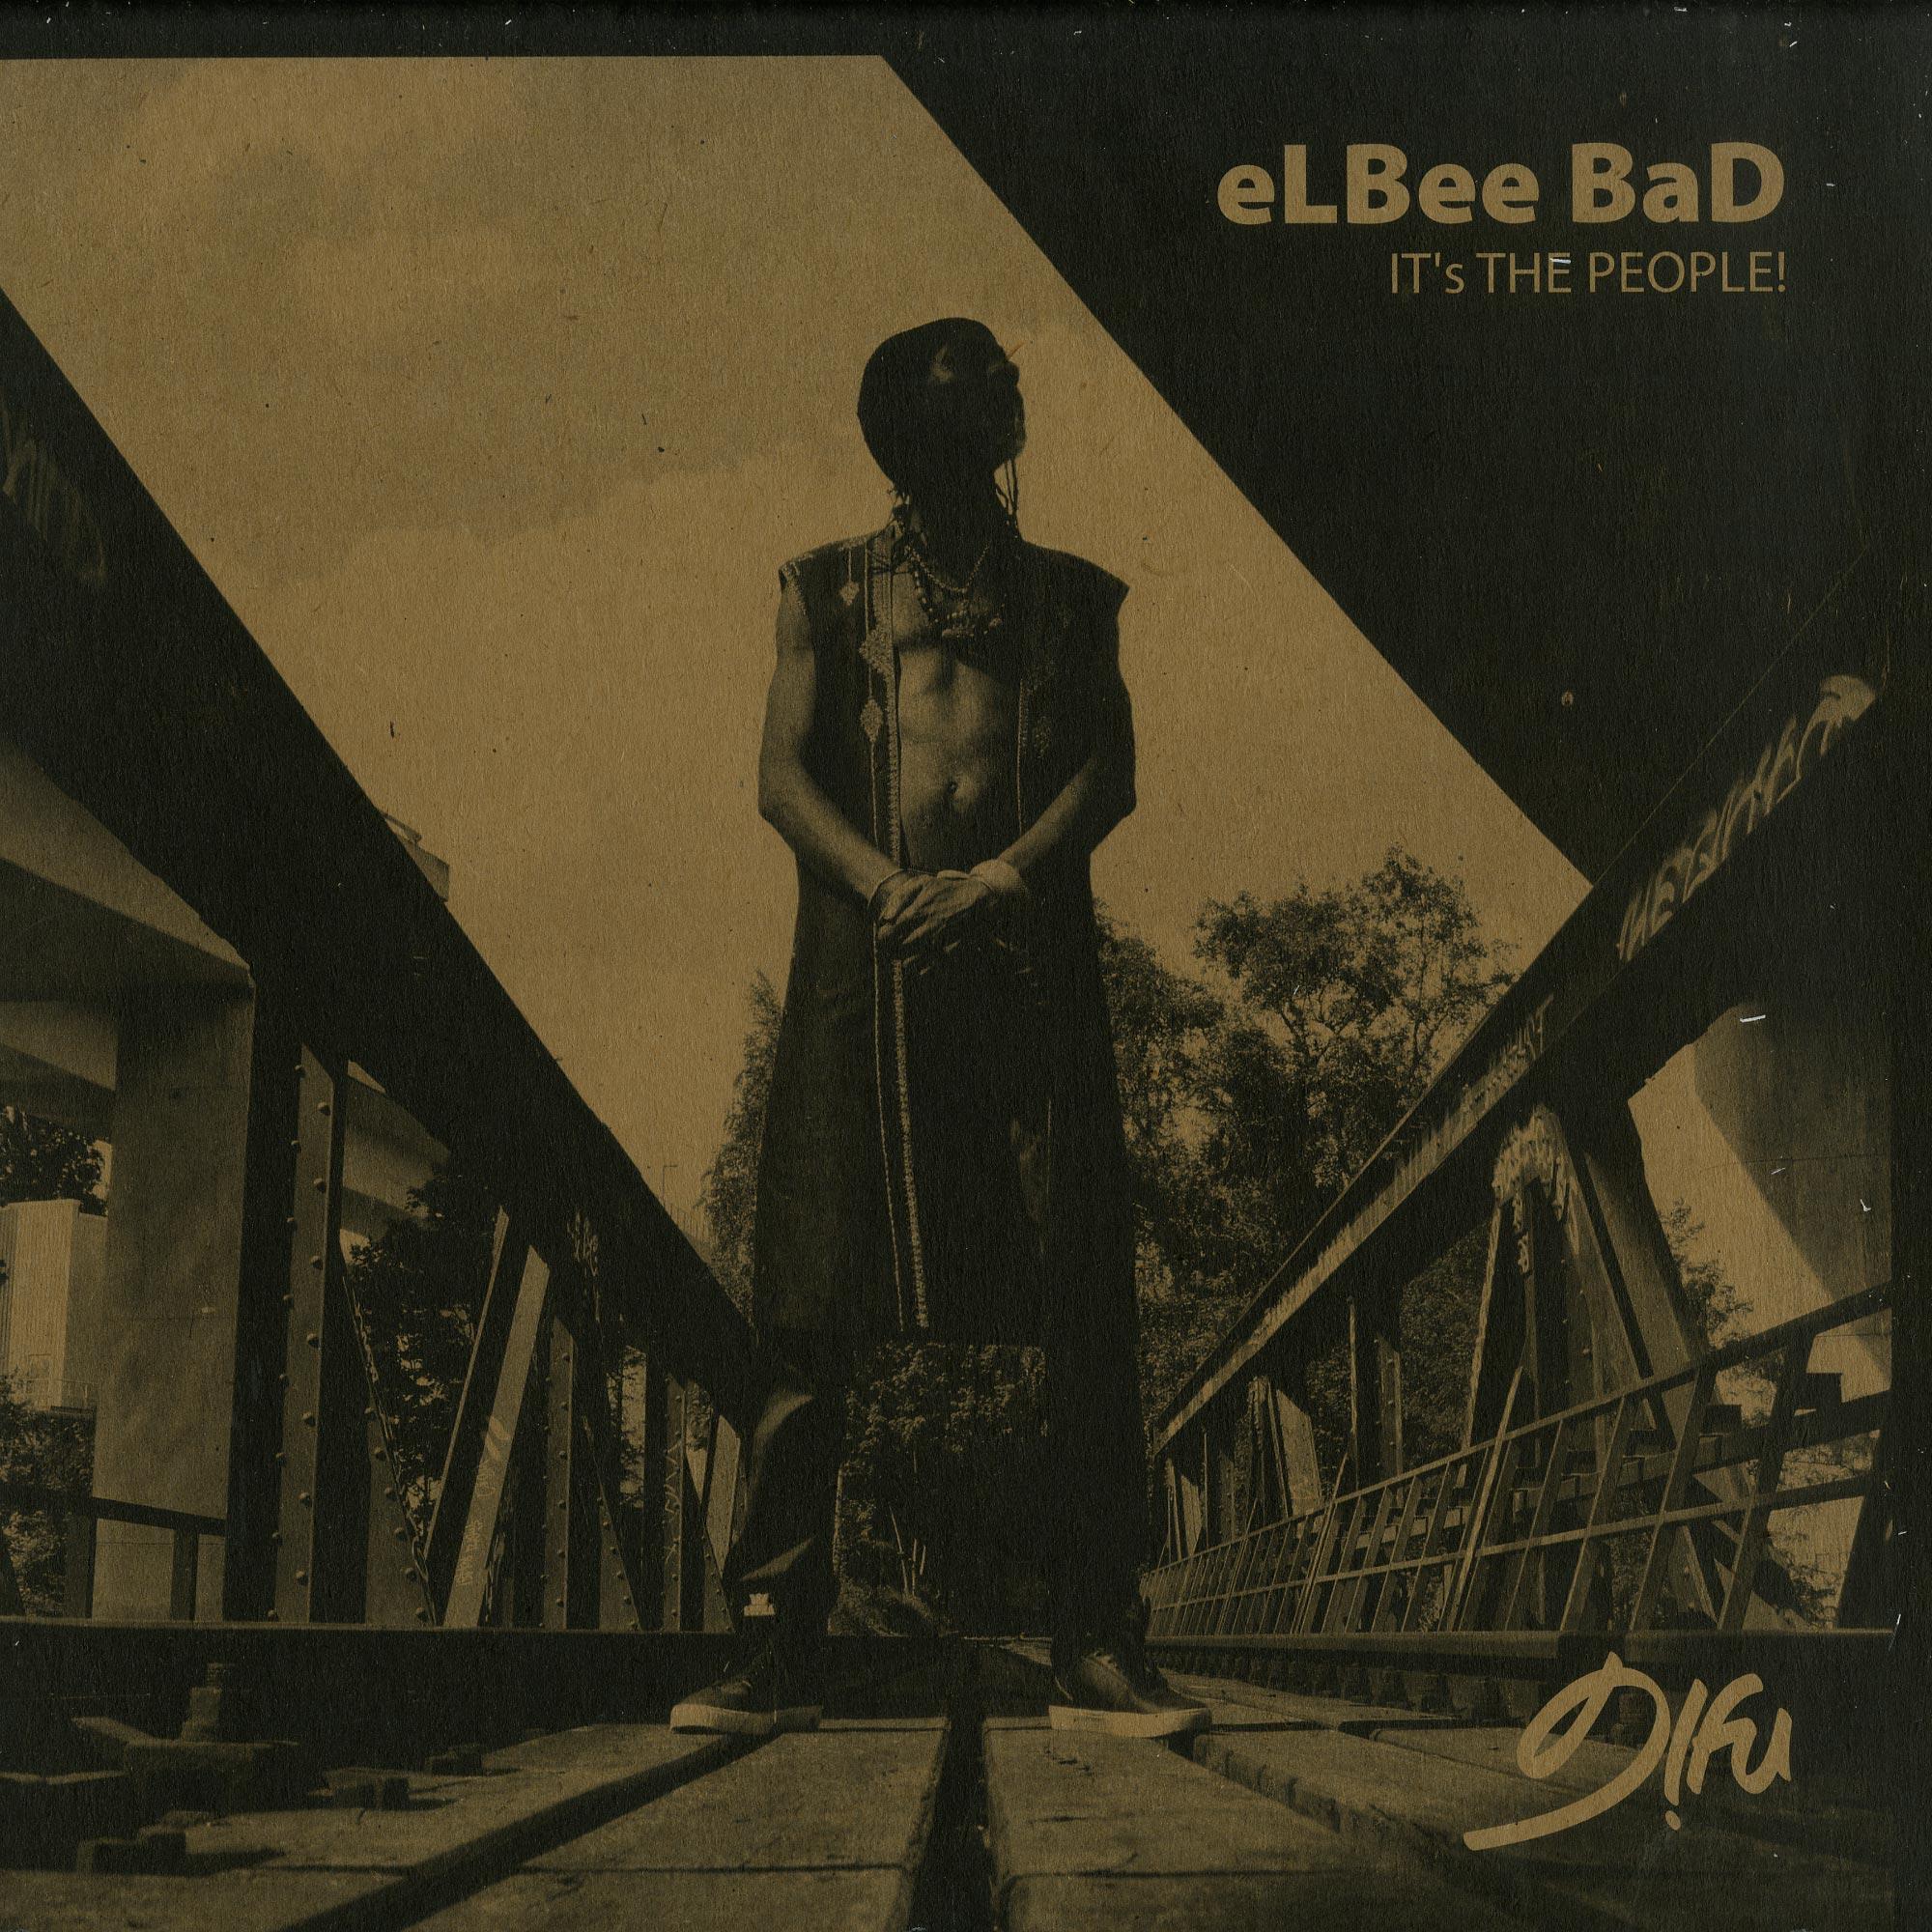 Elbee Bad - ITS THE PEOPLE